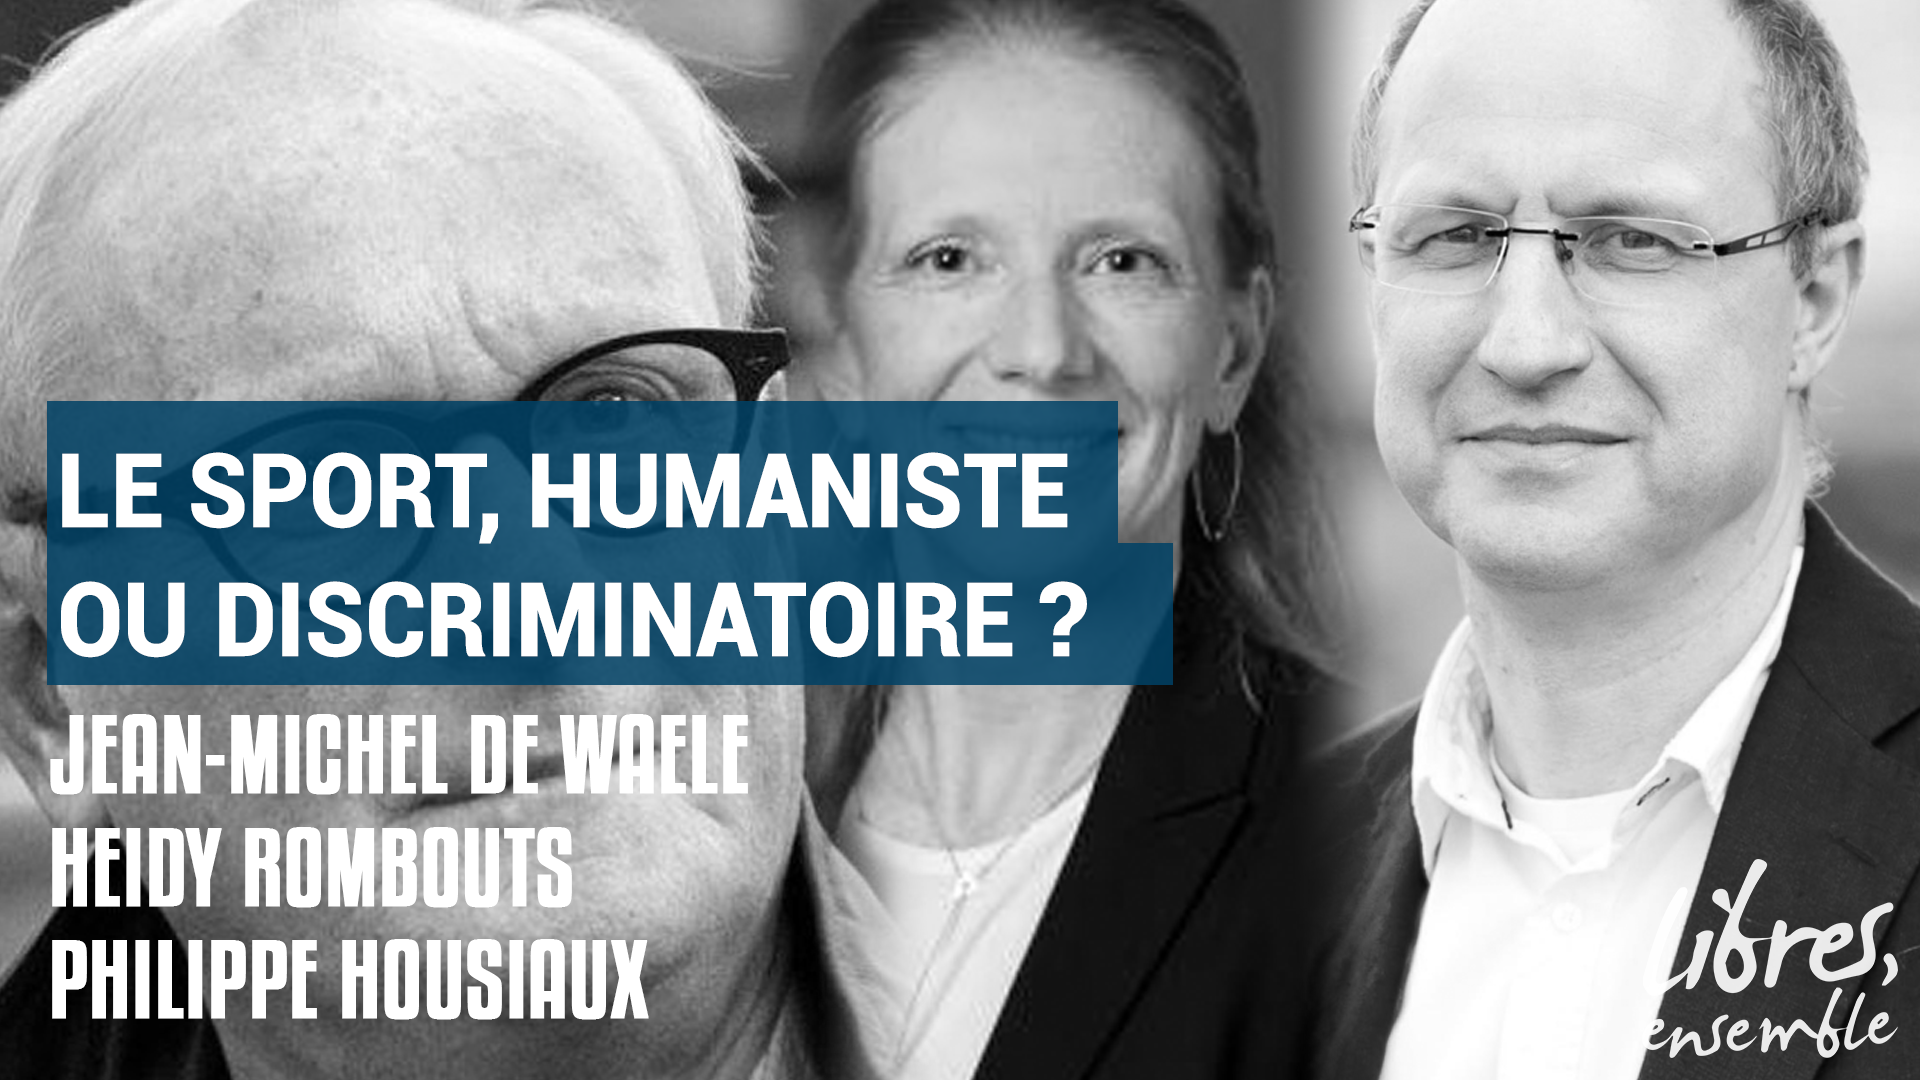 Le sport, humaniste ou discriminatoire ?